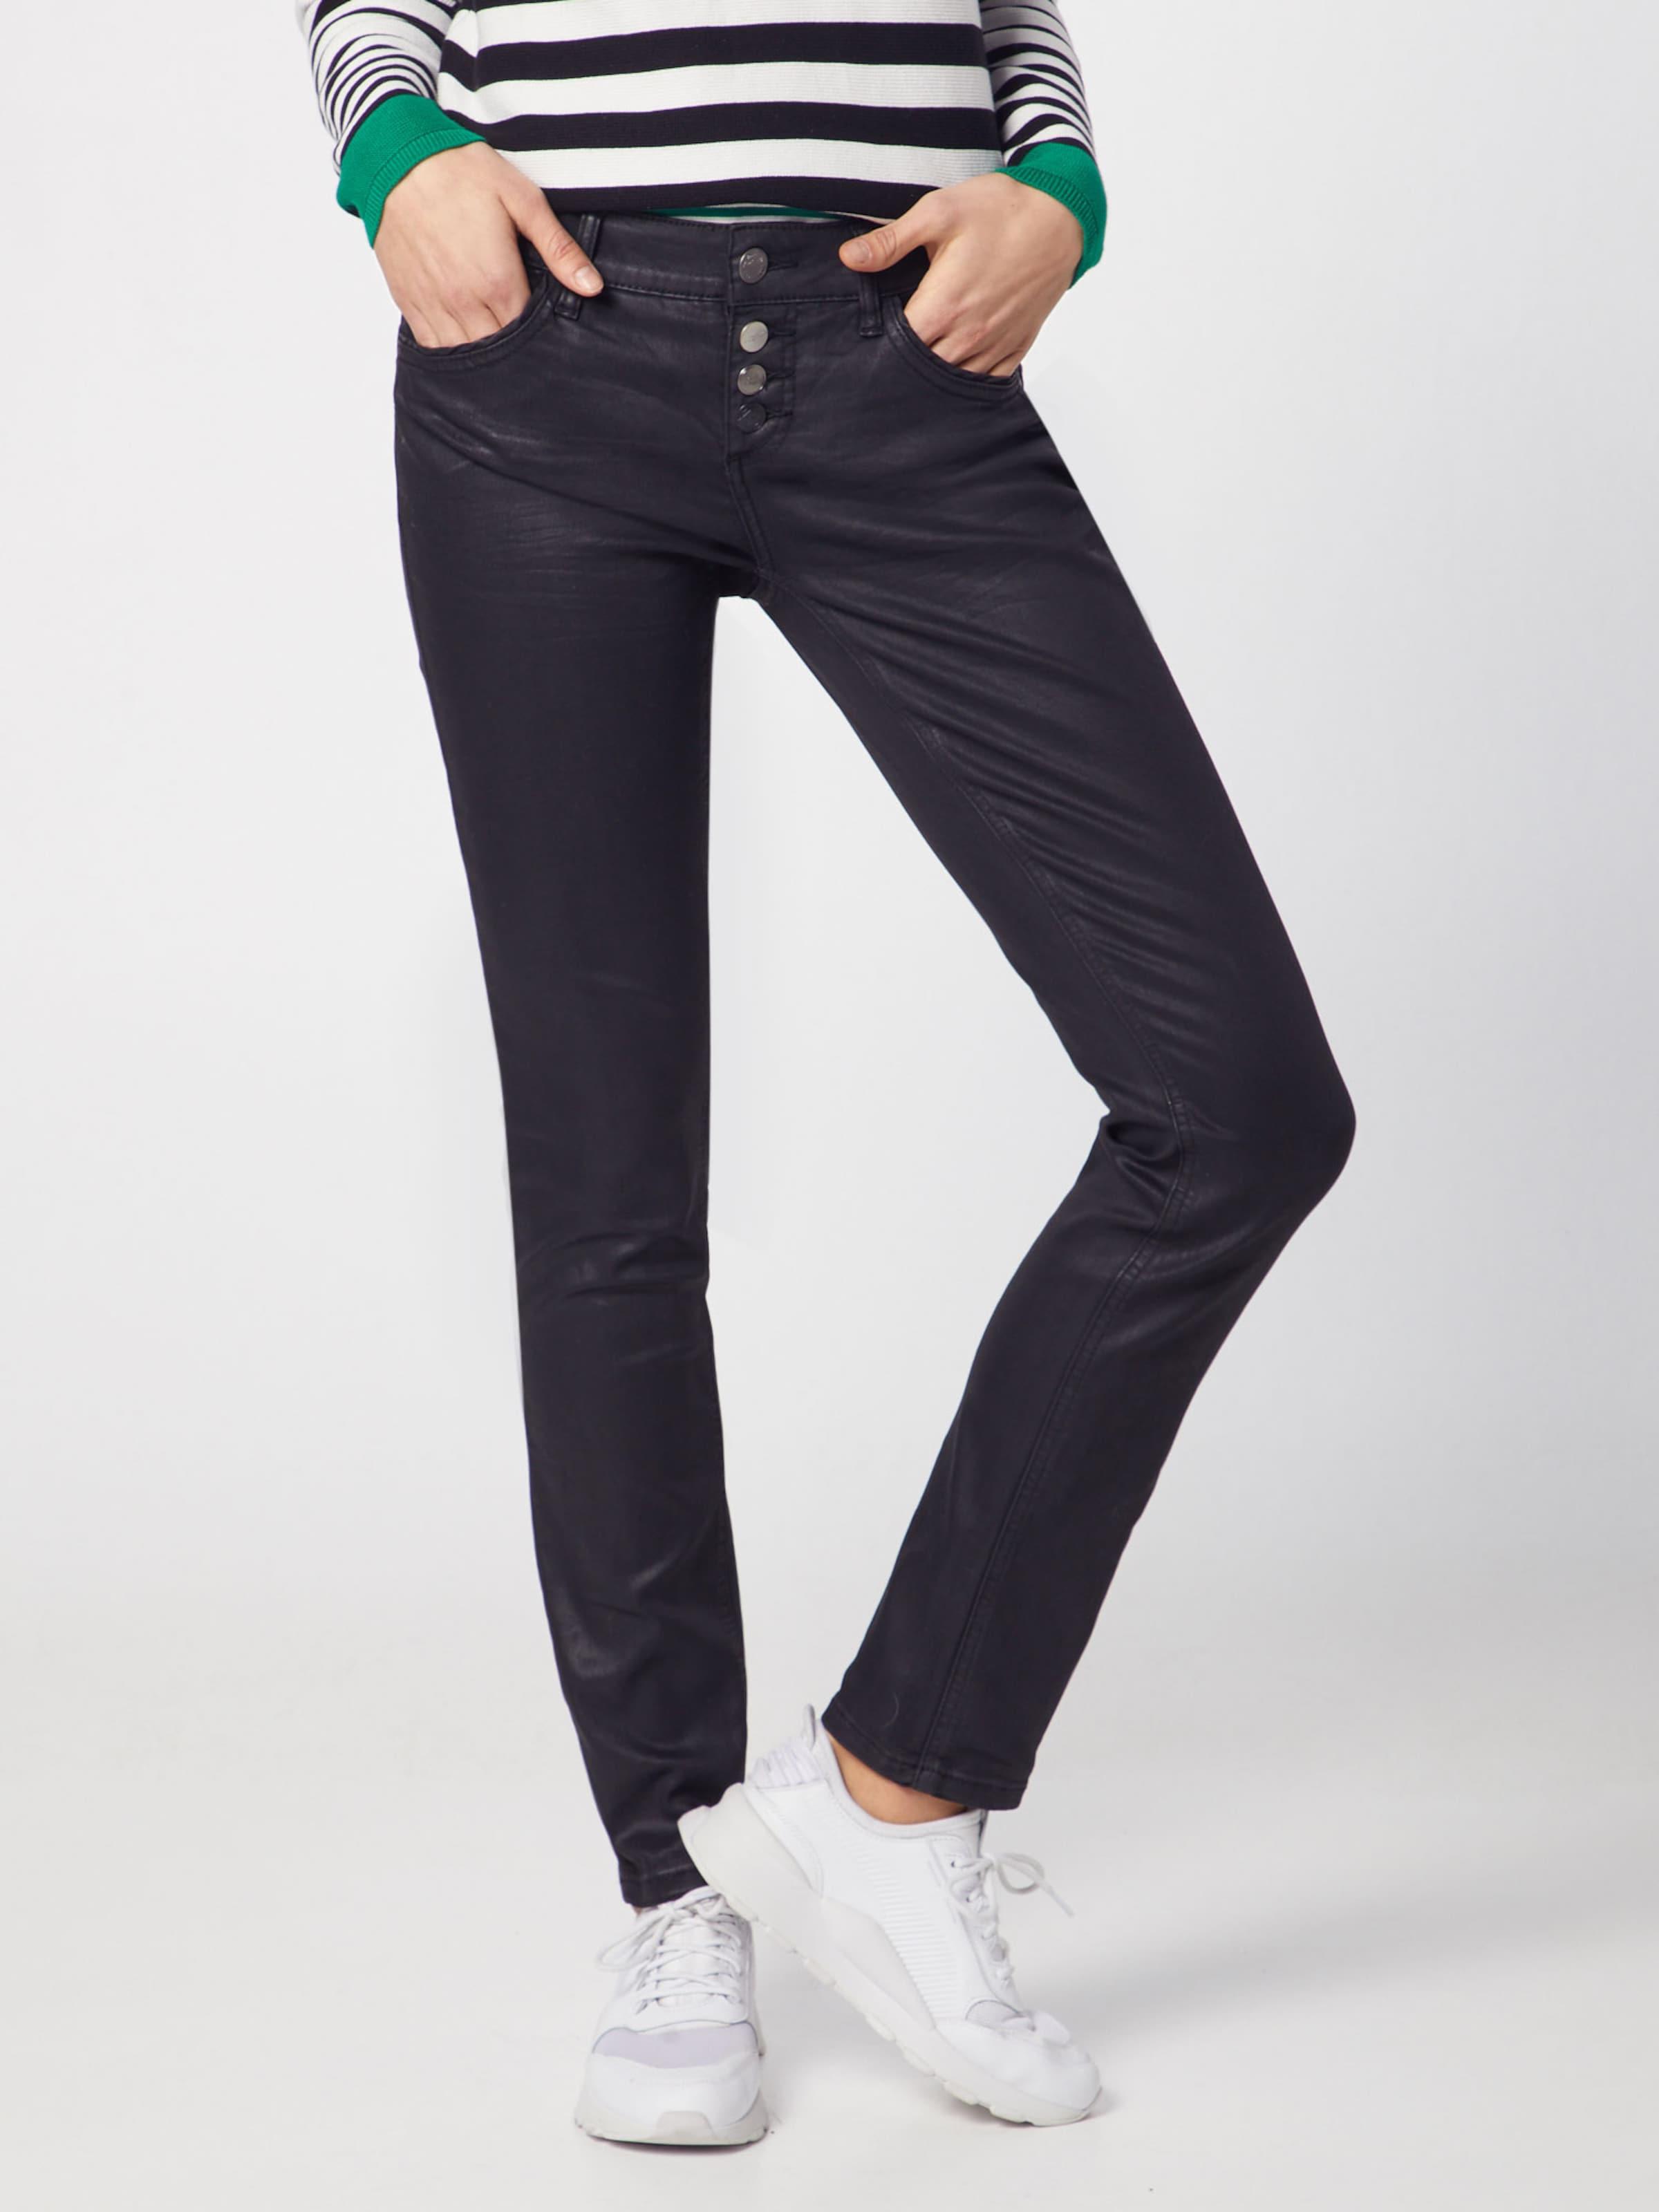 Denim 'crissi' Black One Street Jeans In vN80nwm